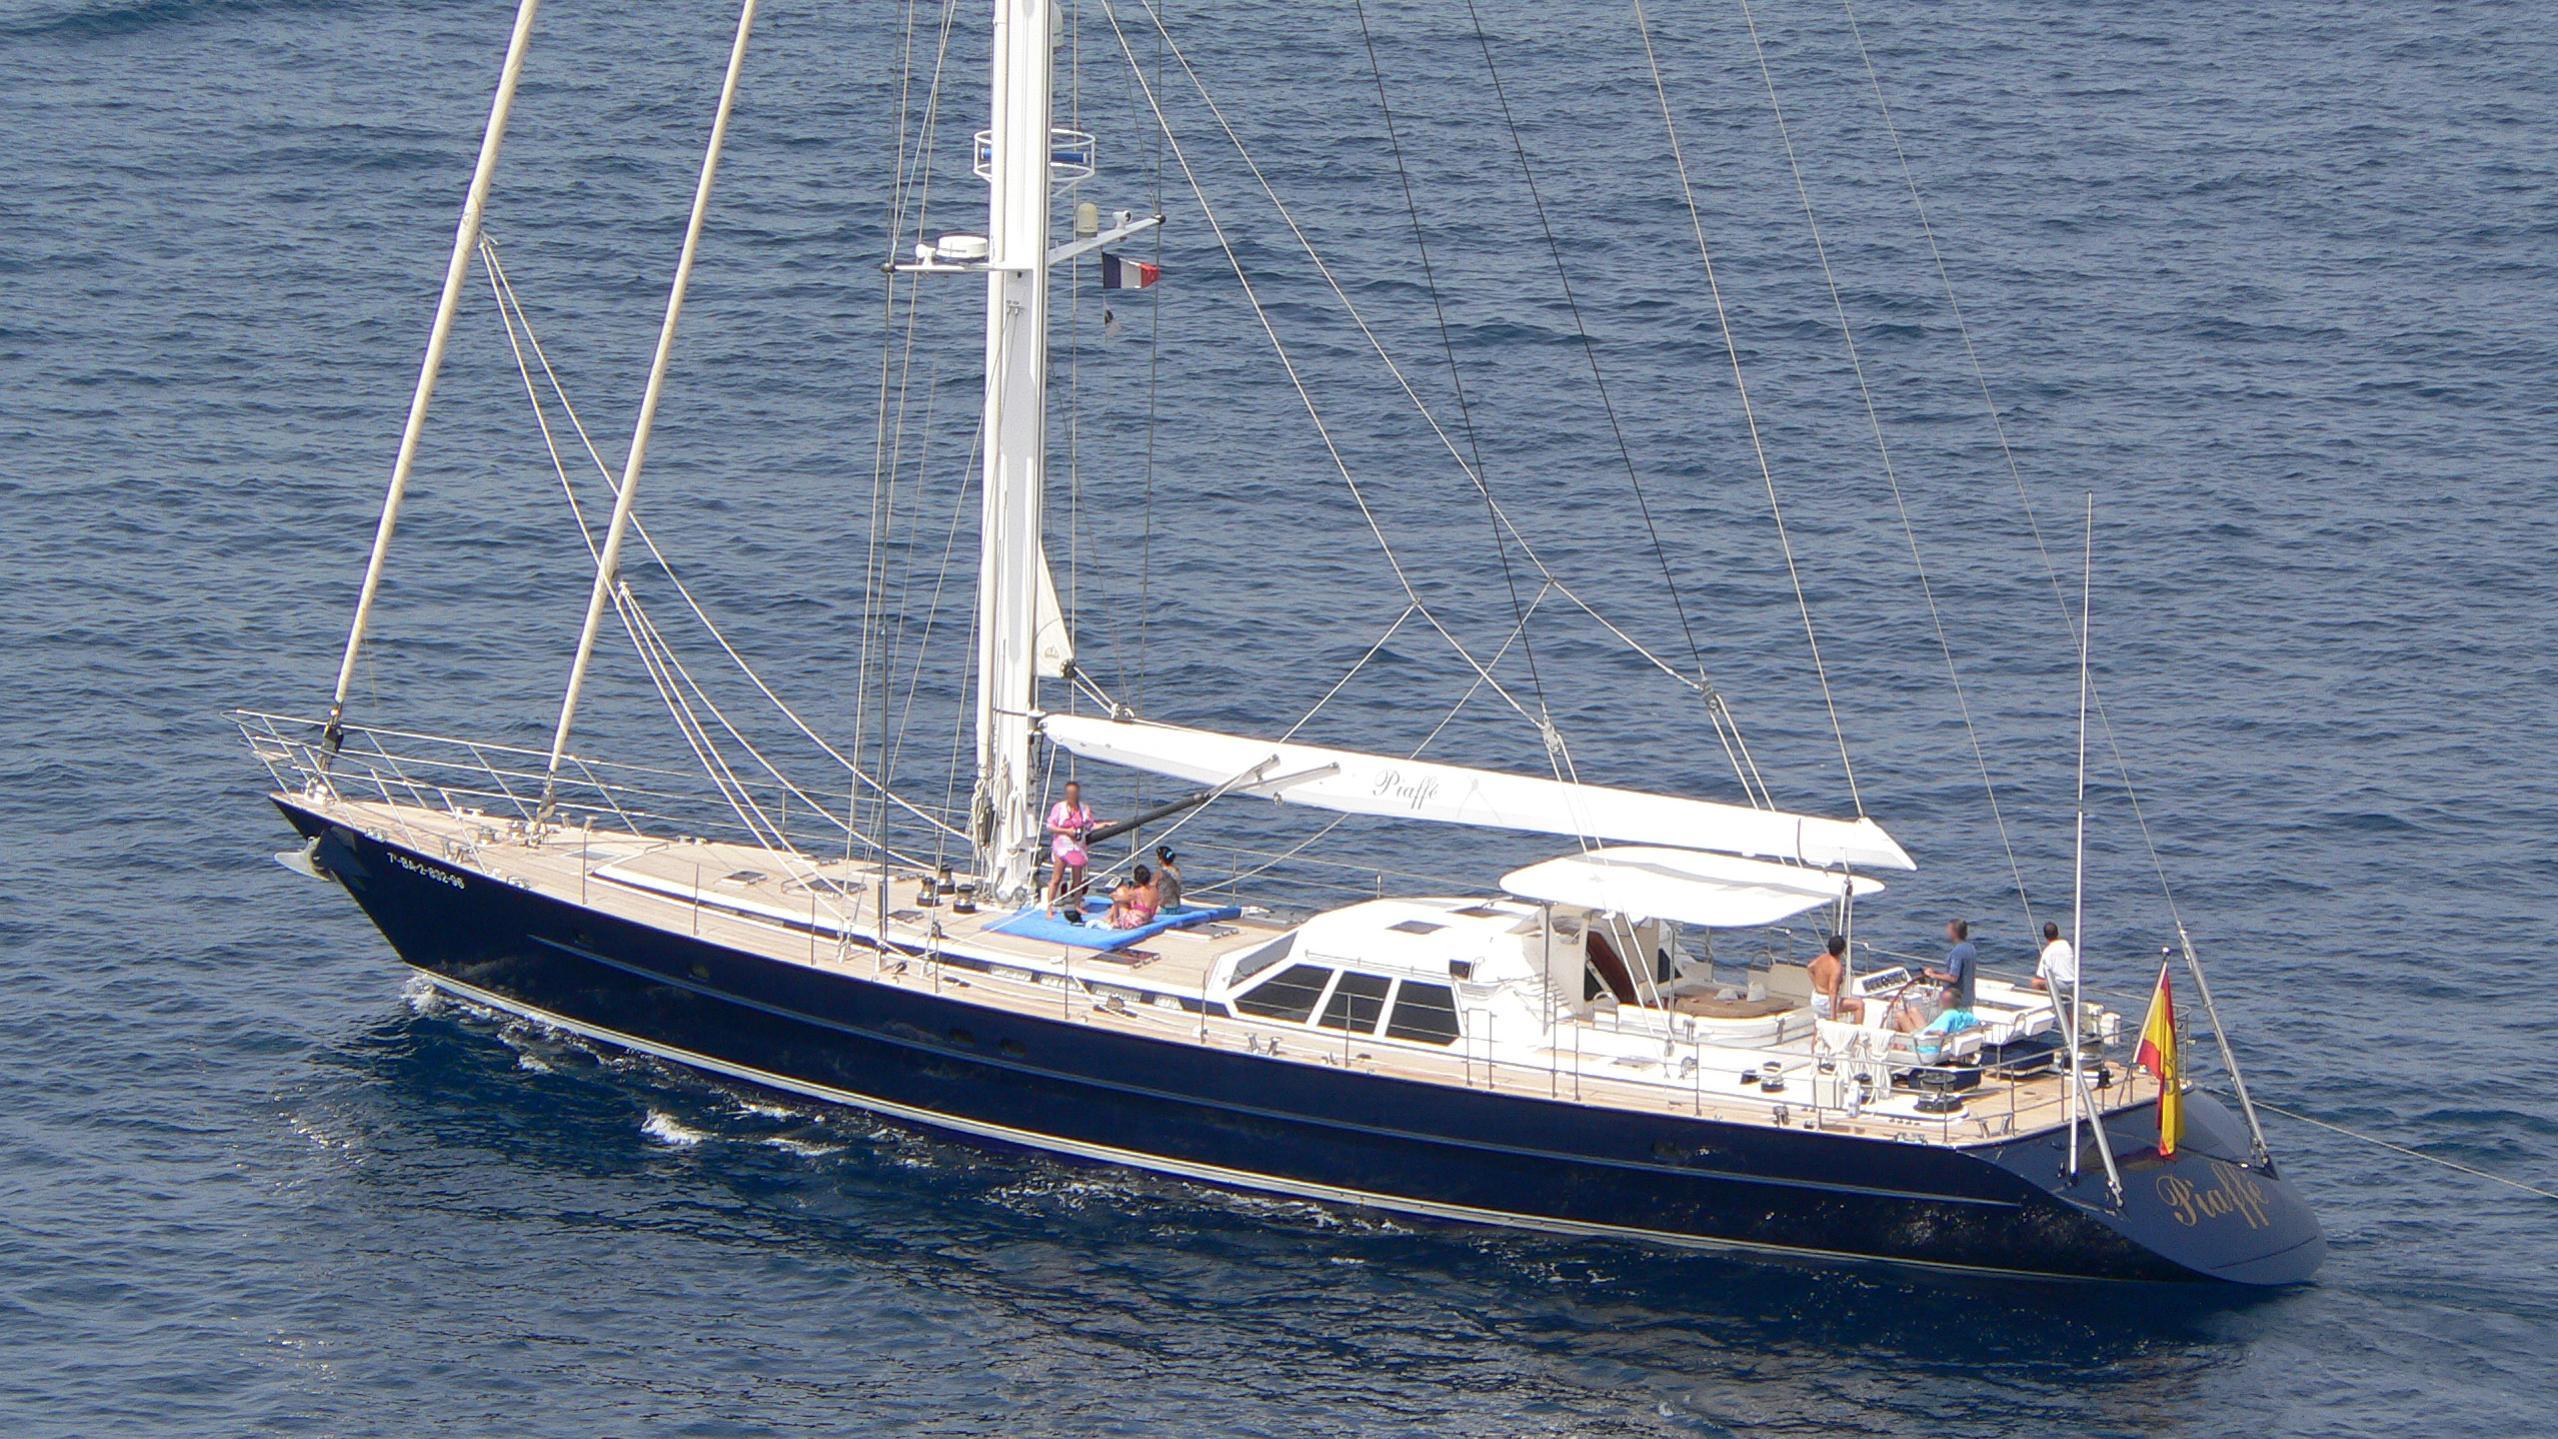 alta marea ex piaffe sailing yacht jongert 29m 1991 half stern before 2008 refit